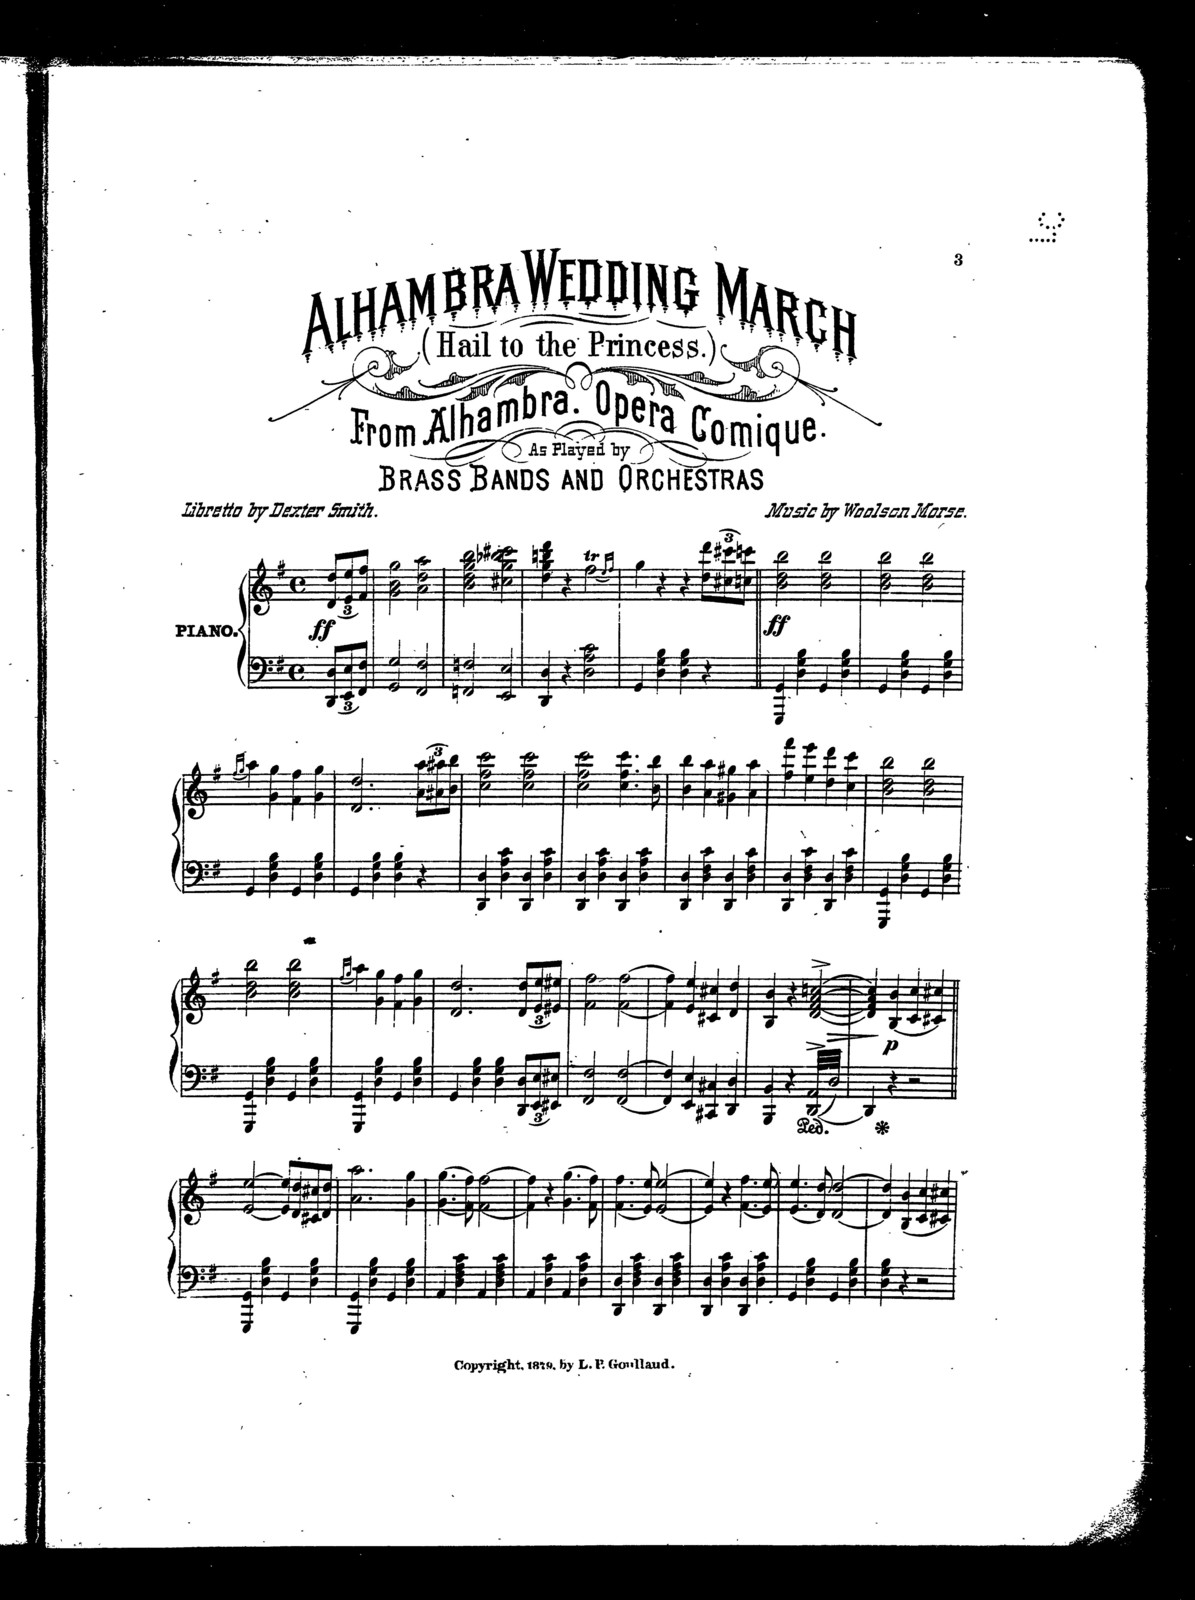 Alhambra wedding march